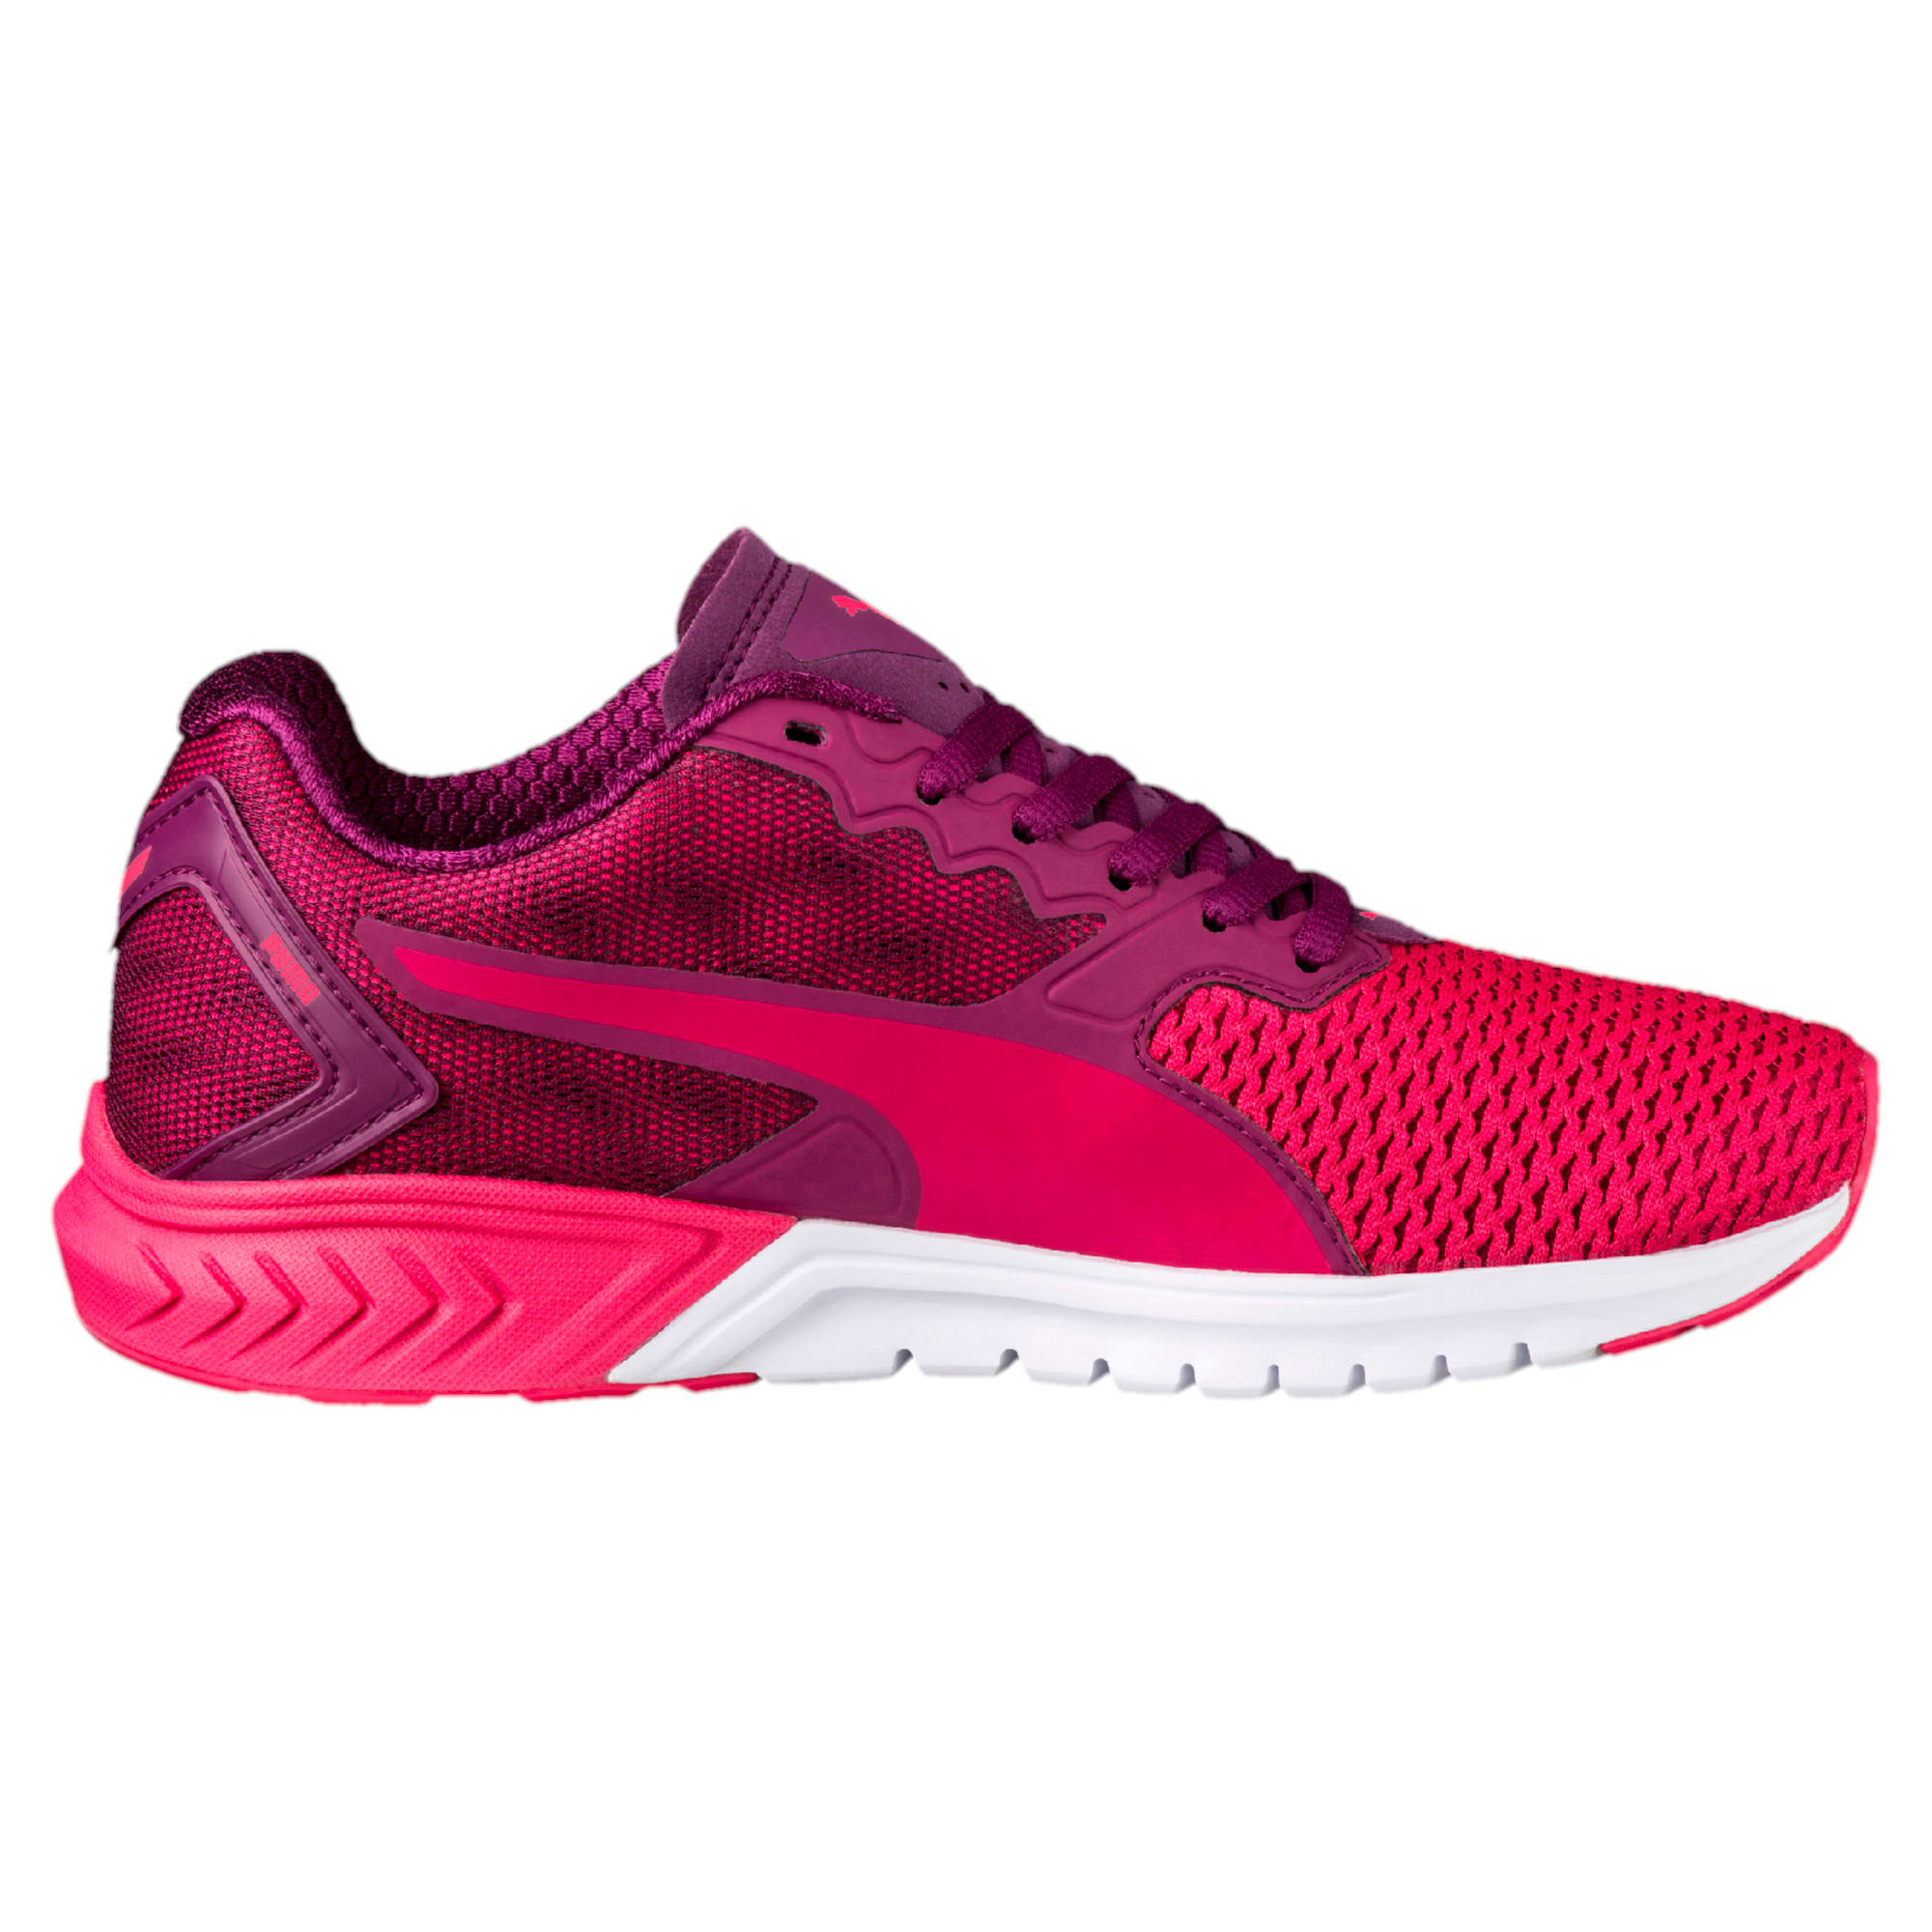 Thumbnail 5 of IGNITE Dual Mesh Kids' Running Shoes, Love Potion-Dark Purple, medium-IND